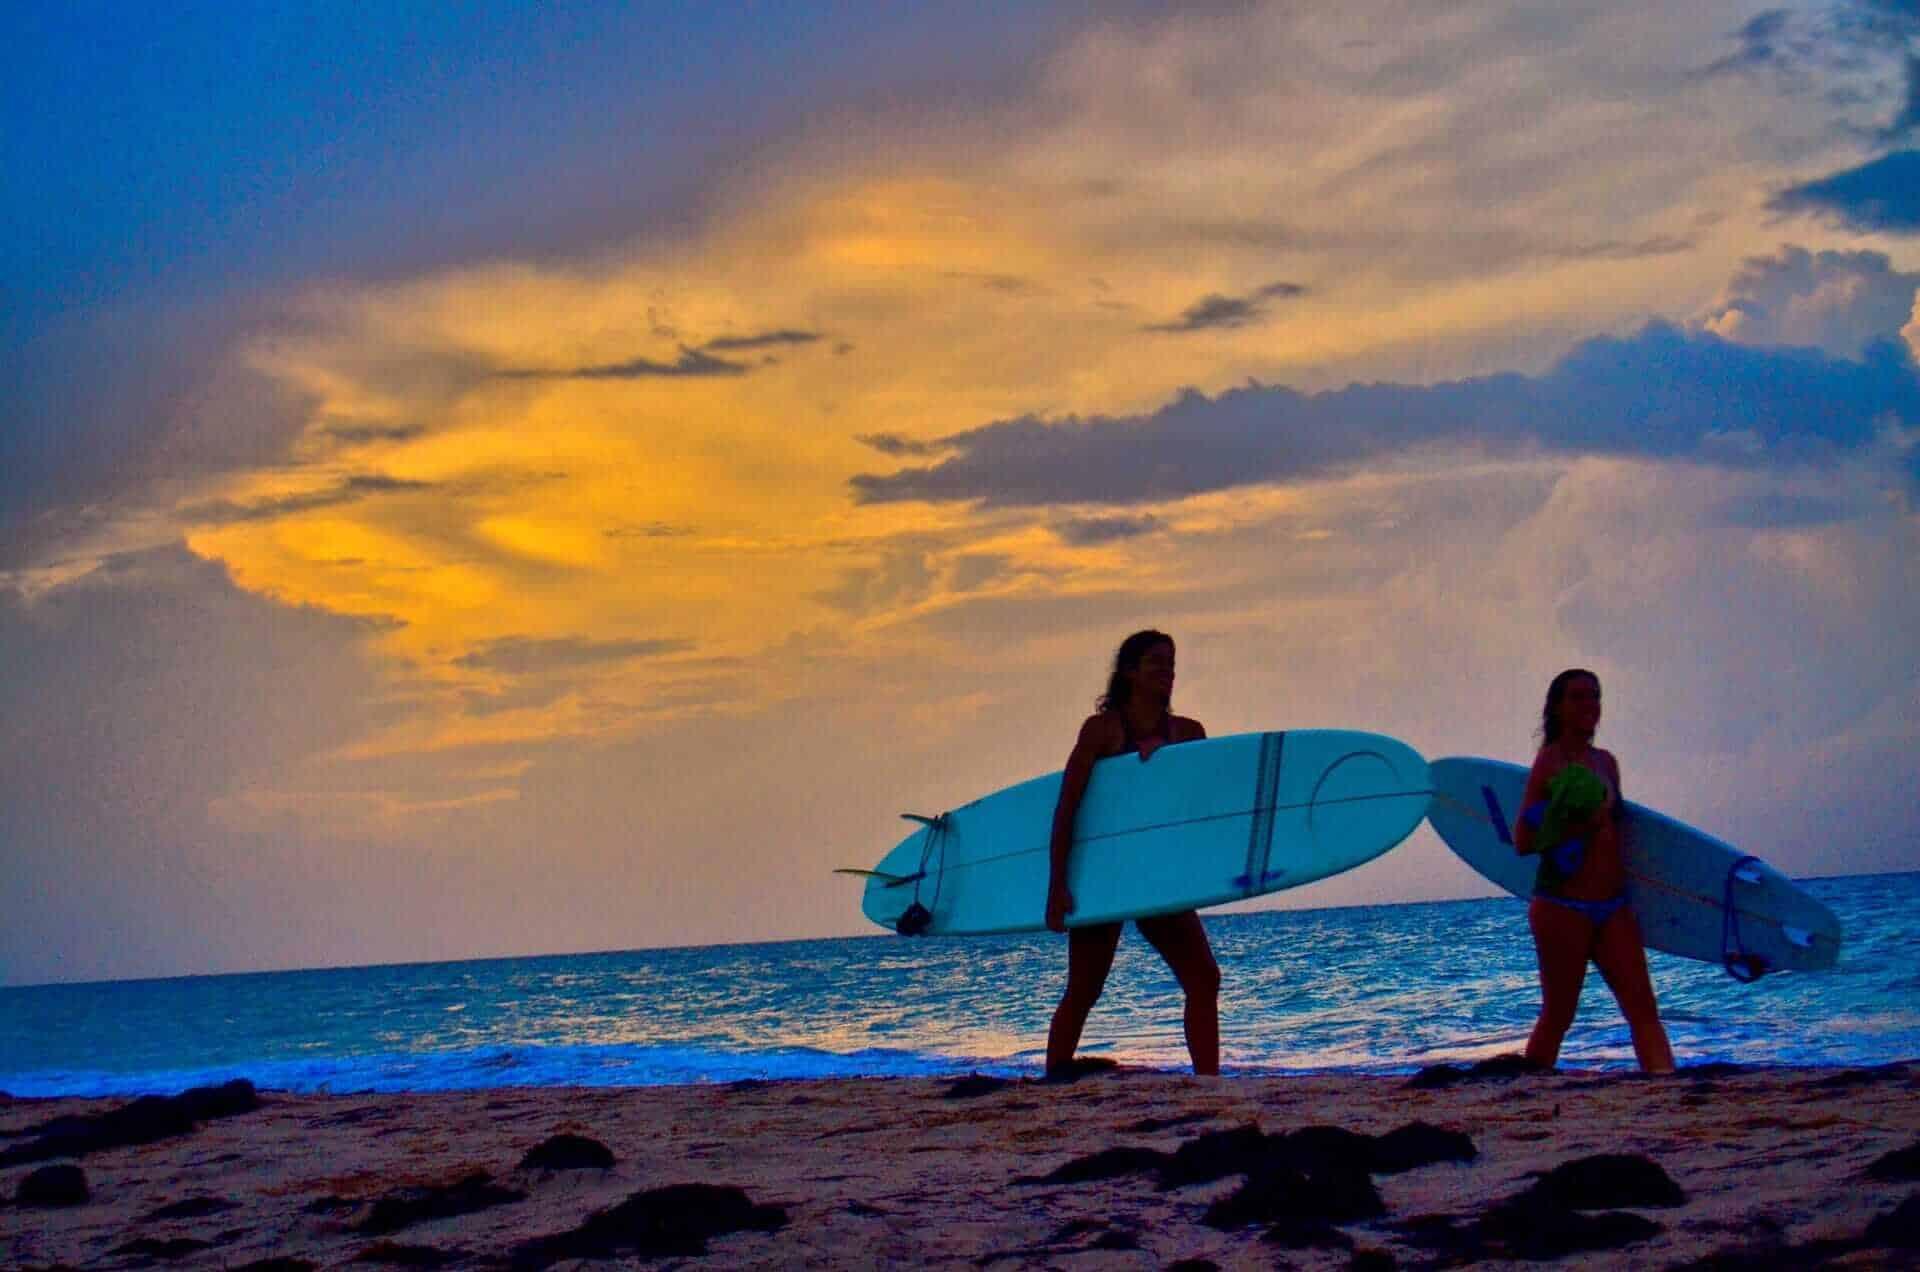 Puerto rico beach sports